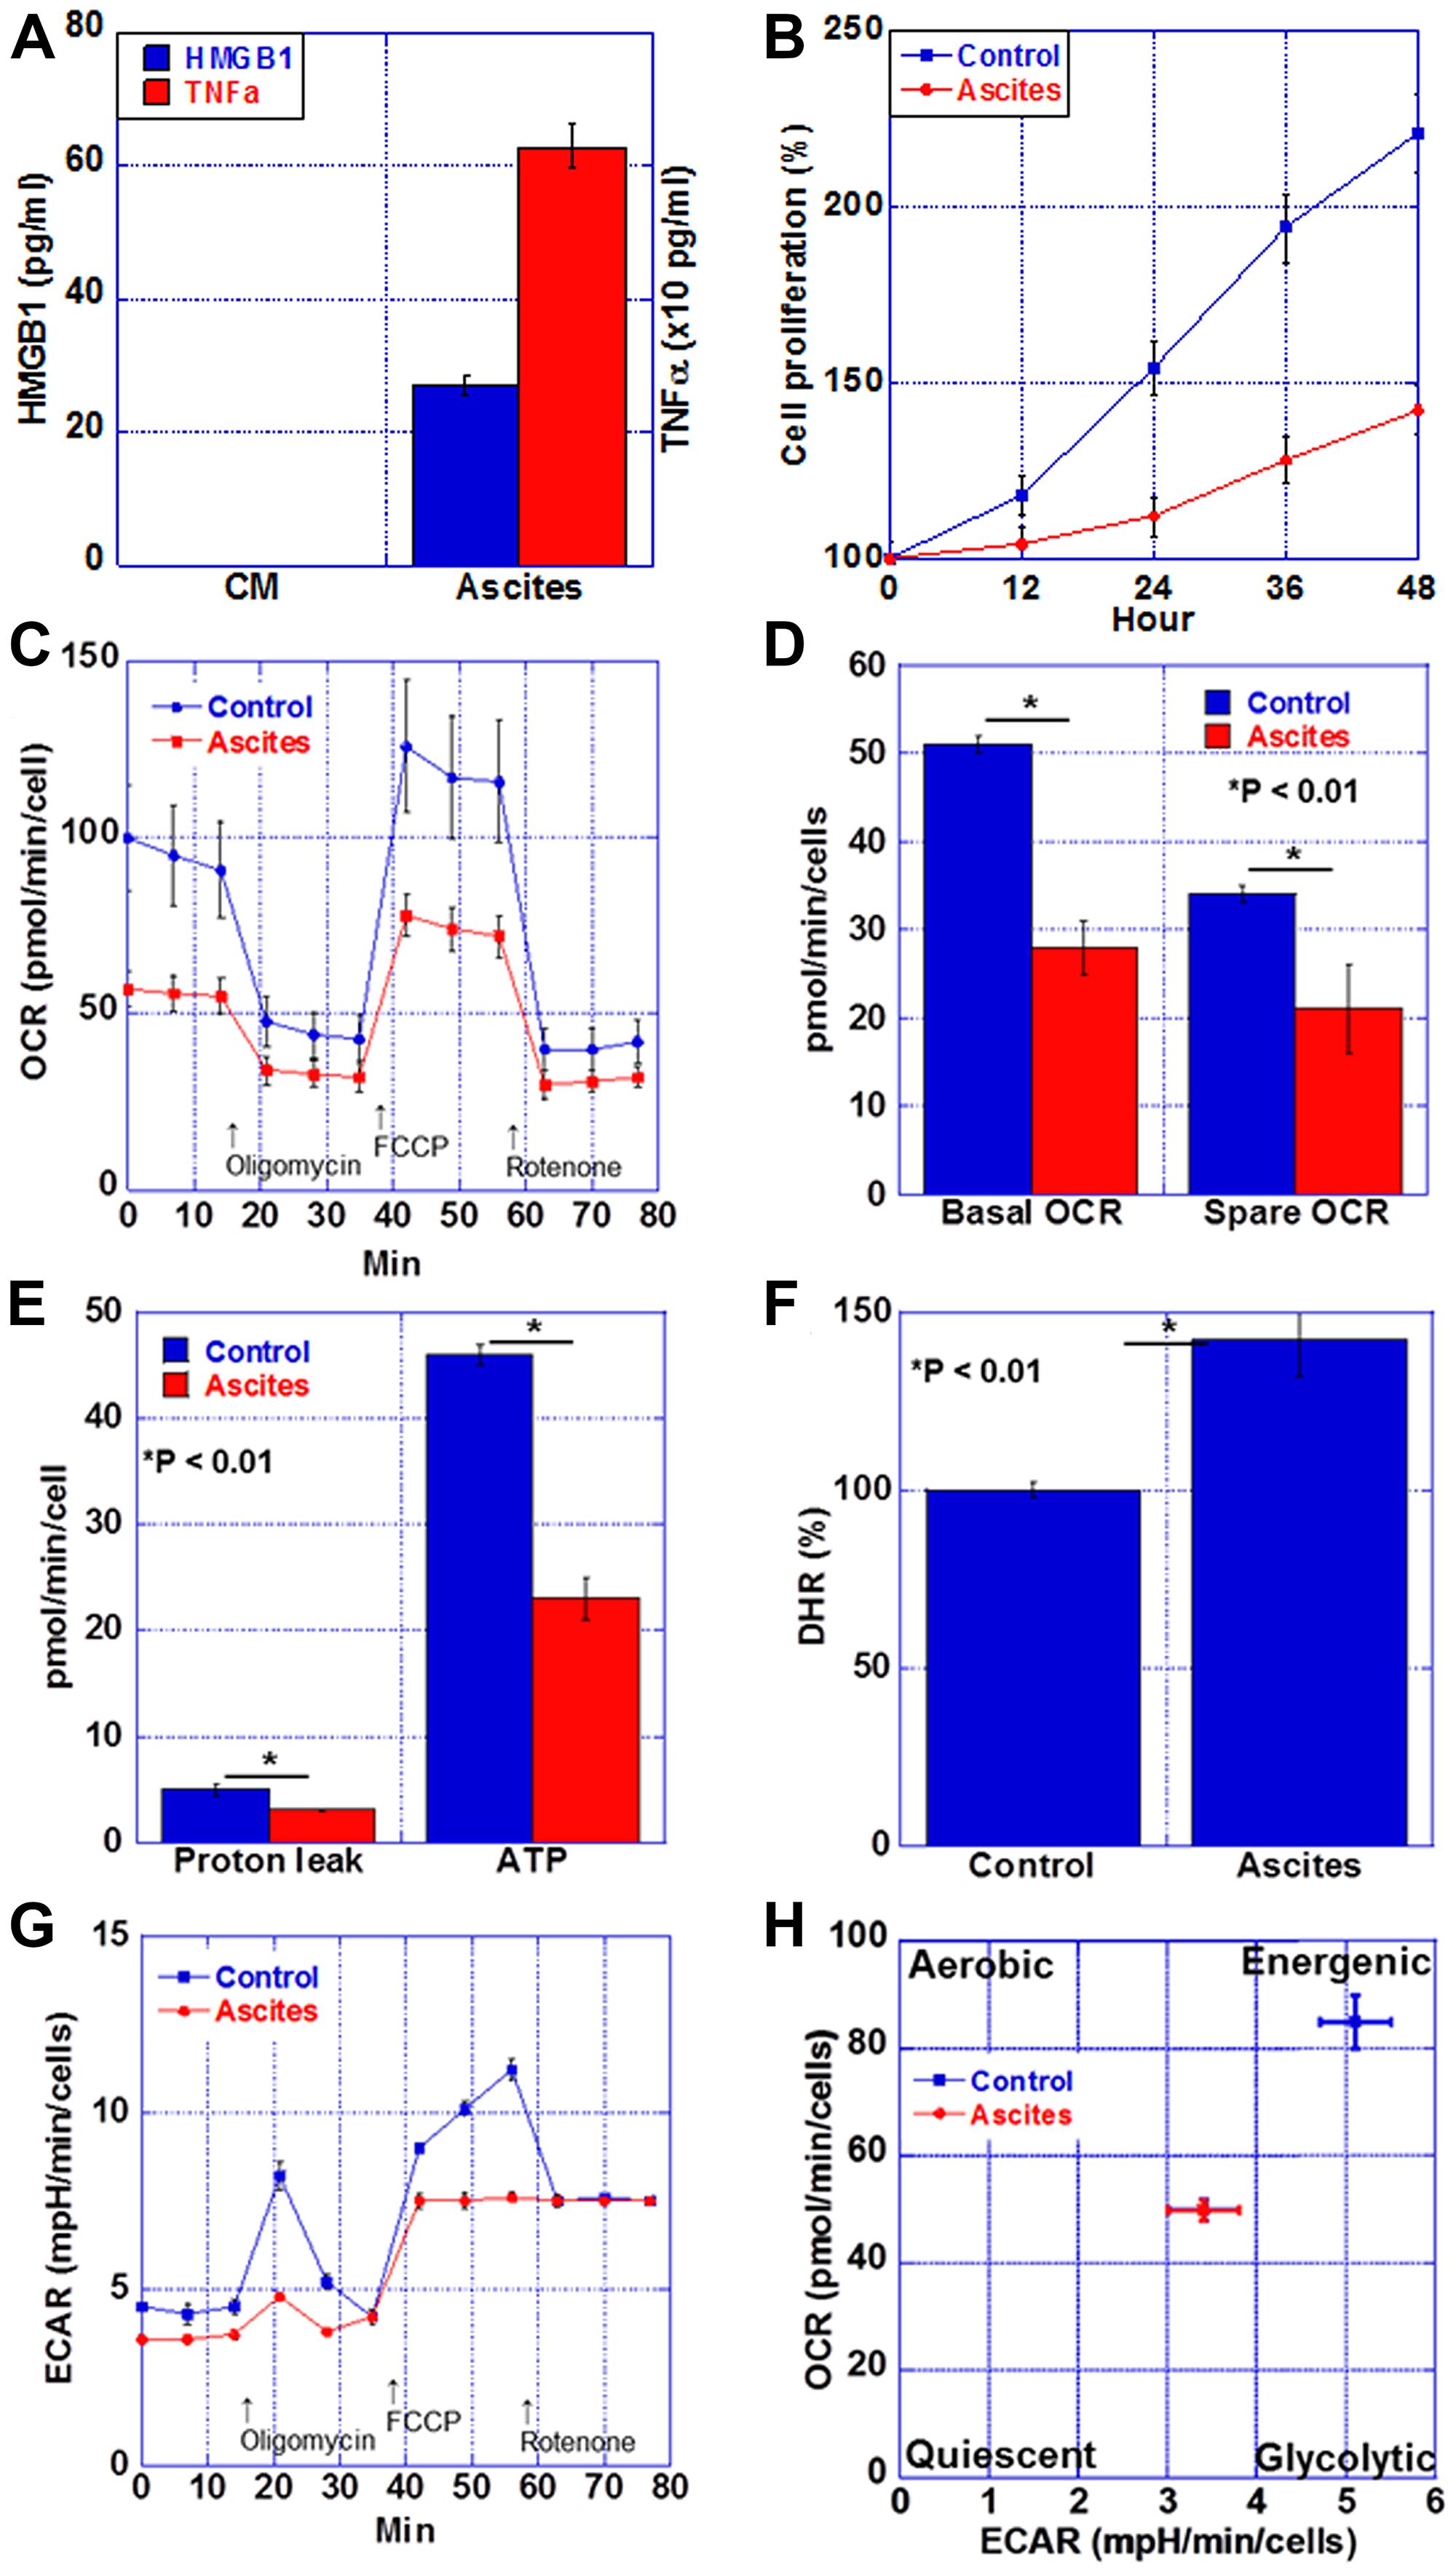 Energy metabolism in the myocardium of CT26-inoculated BALB/c mice.